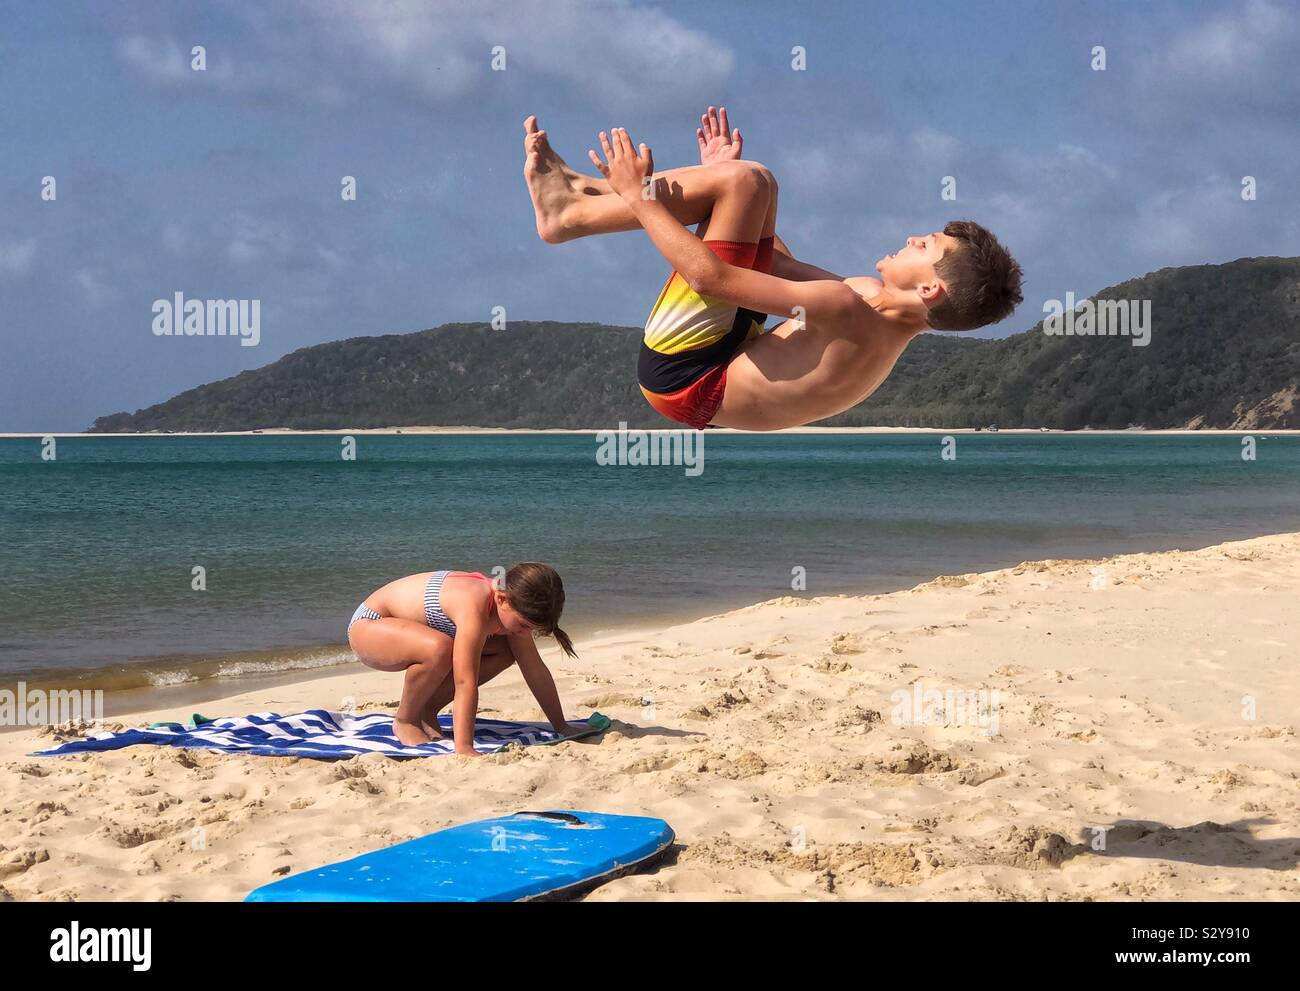 Niños jugando en la playa backflip acrobacia tumbling Foto de stock